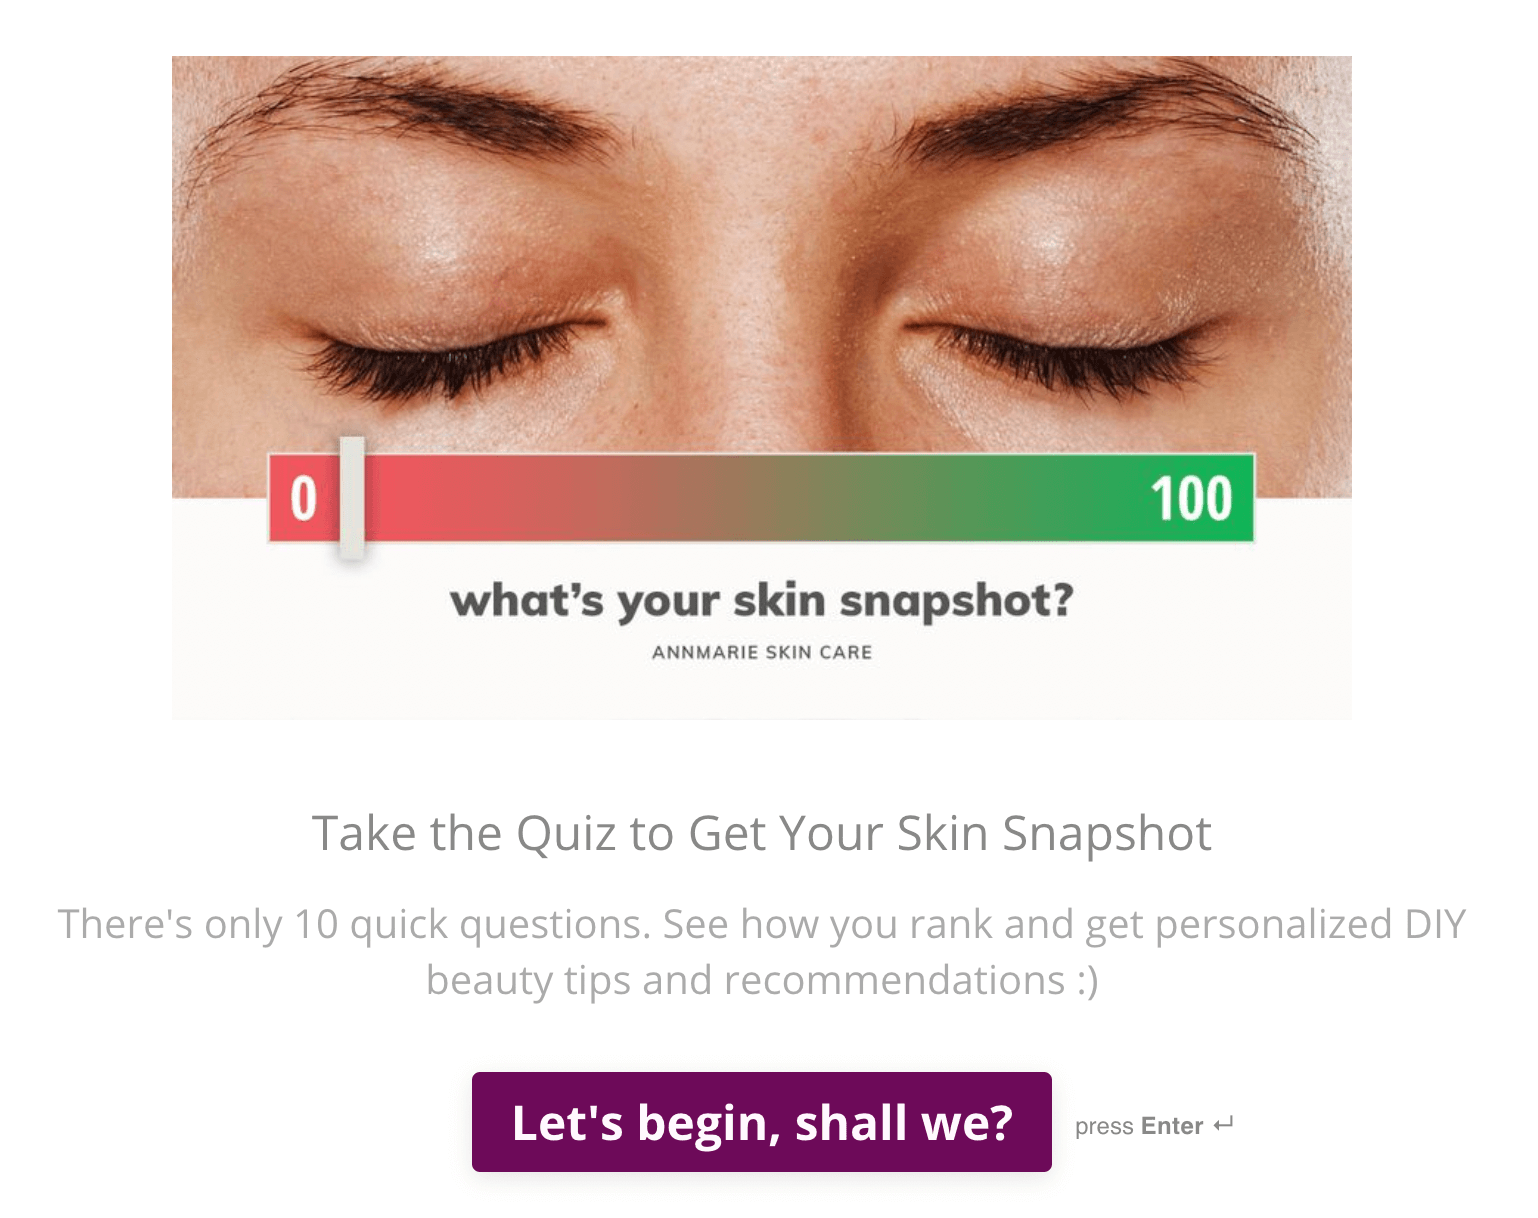 skin snapshot quiz example